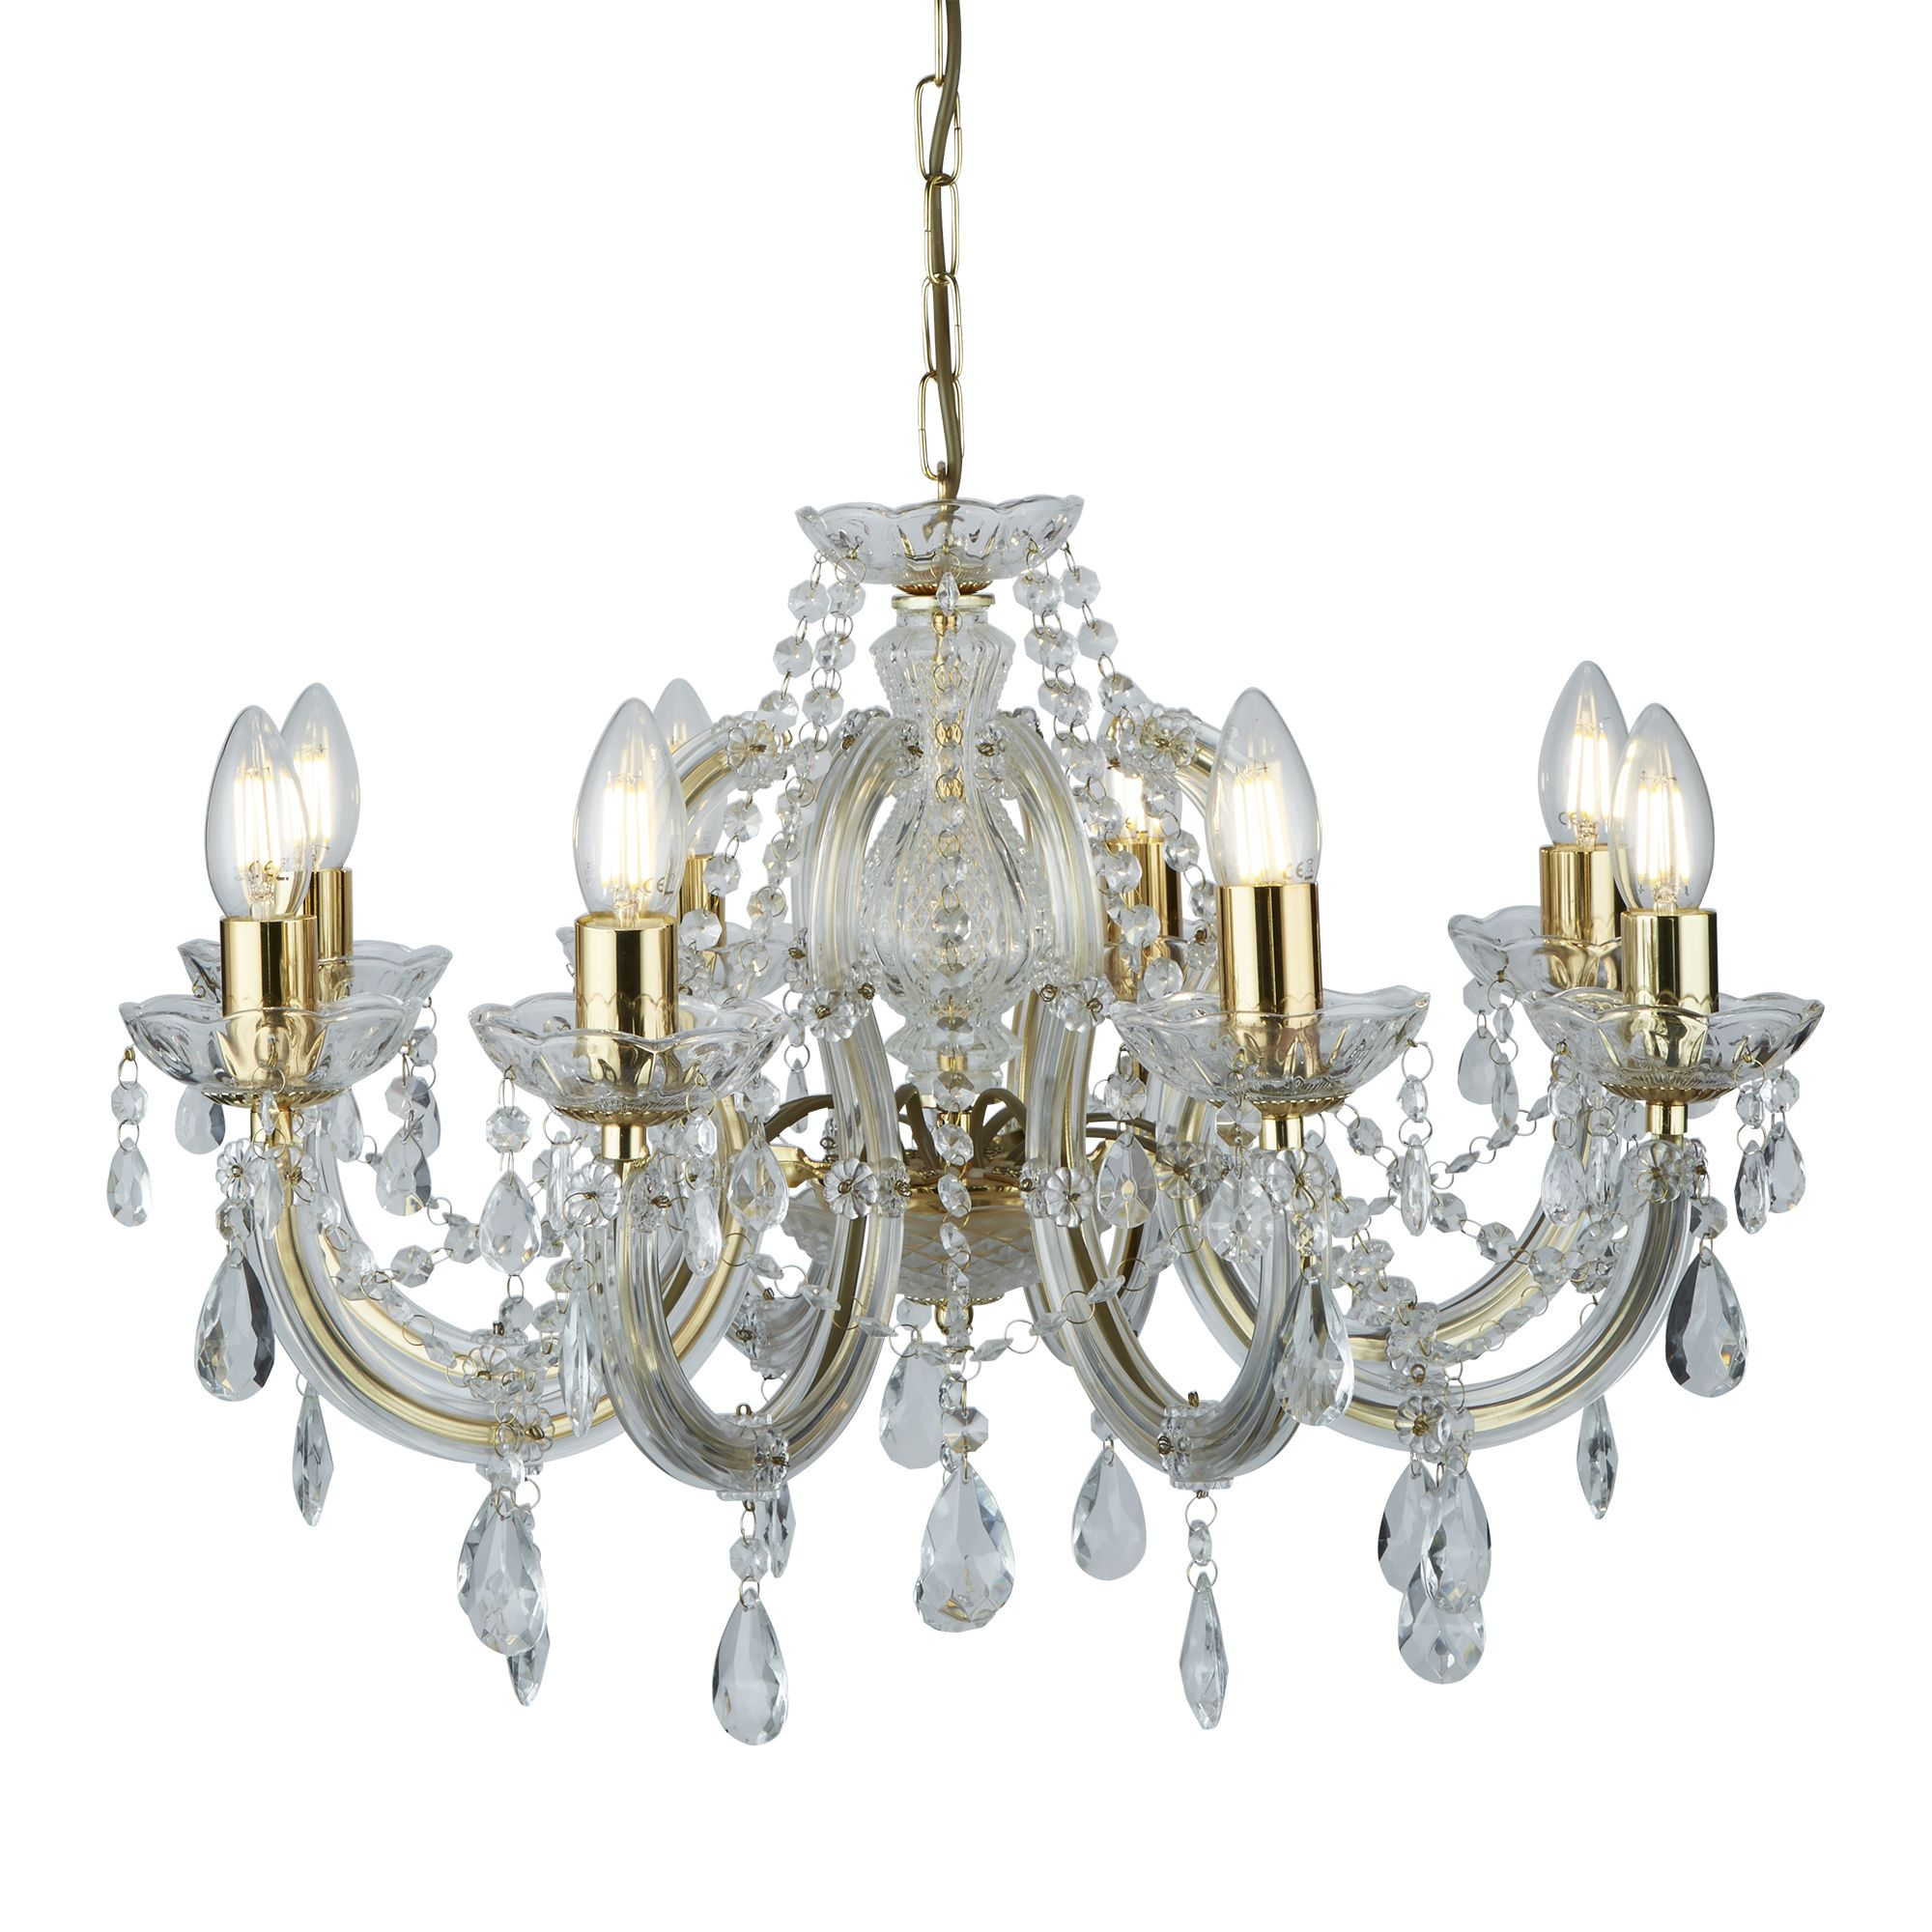 Searchlight Marie Therese kristály lámpa